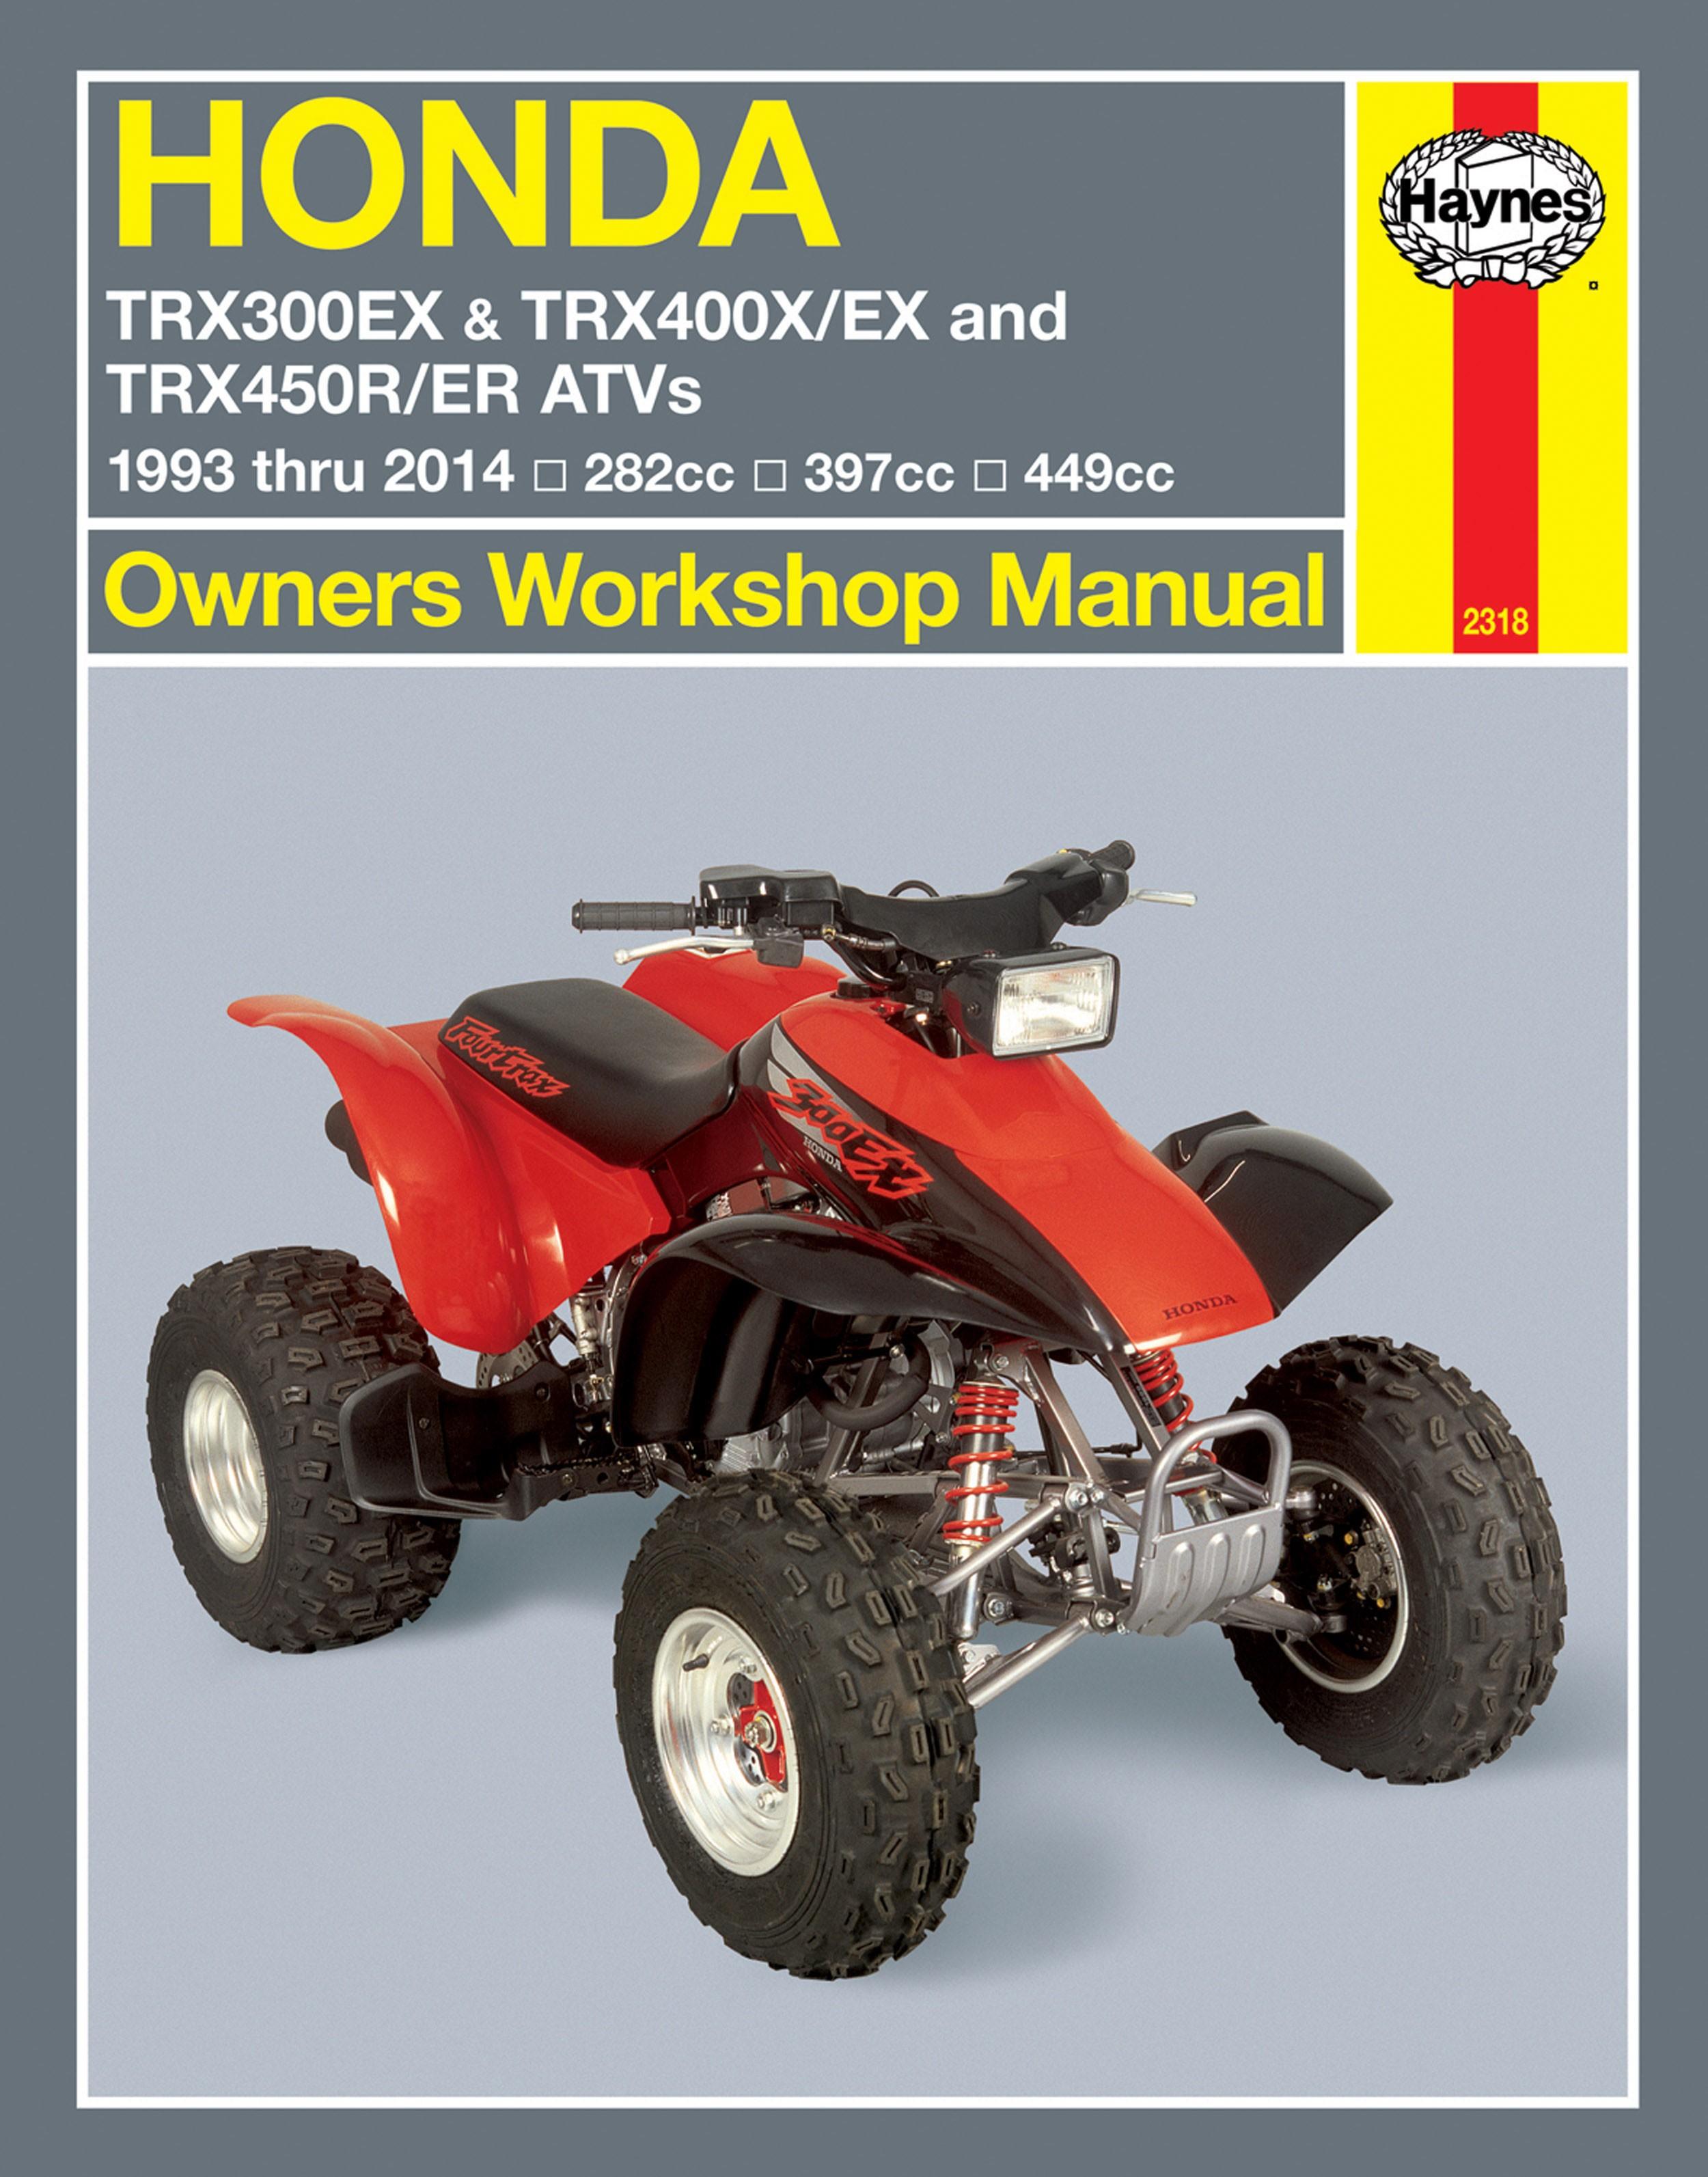 HAYNES Repair Manual - Honda ATVs TRX300EX (1993-14) TRX400EX (1999-14)  TRX400X (2009-14) TRX450R ...